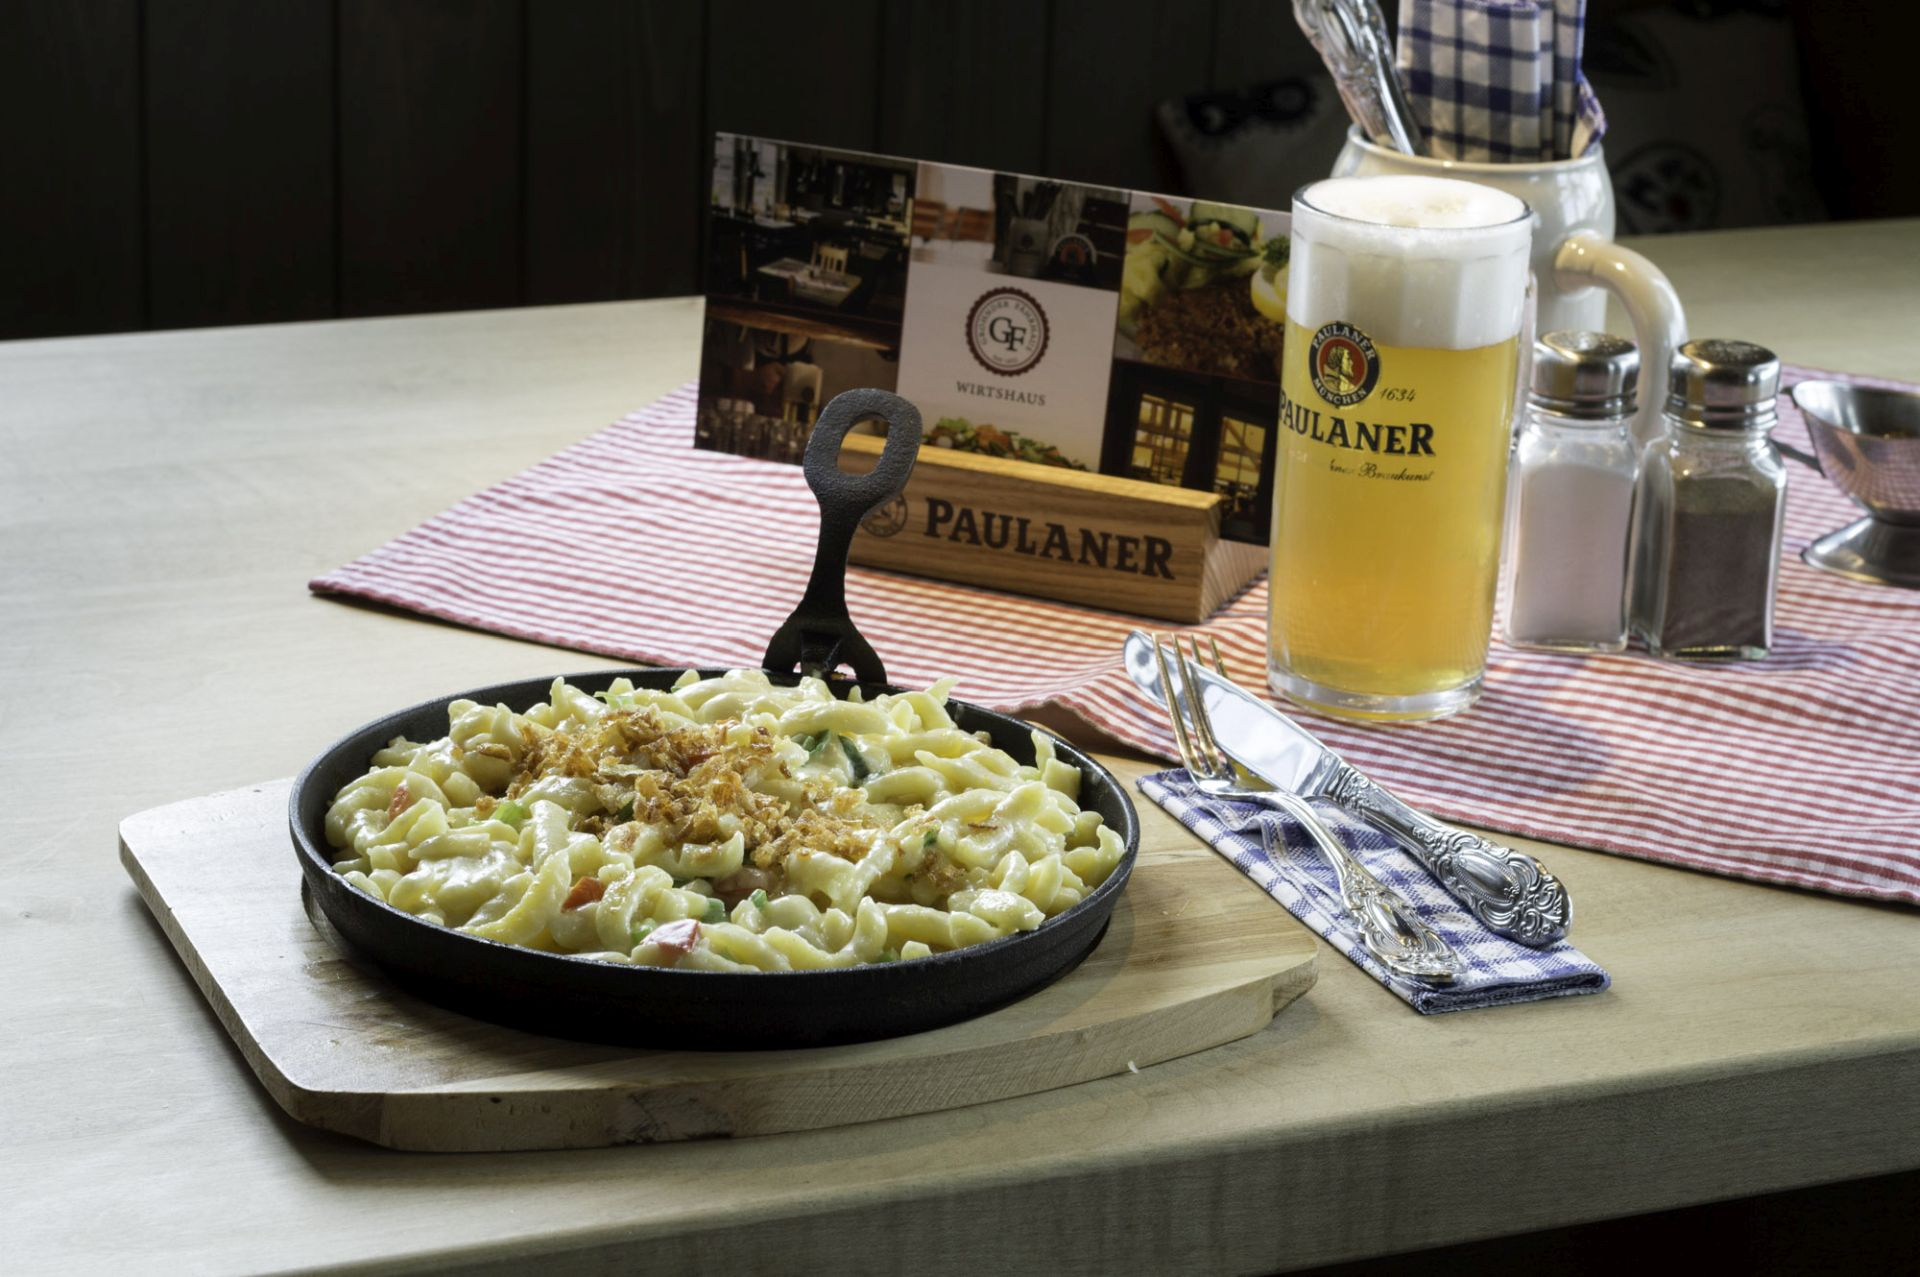 Gastronomie in Emmerthal